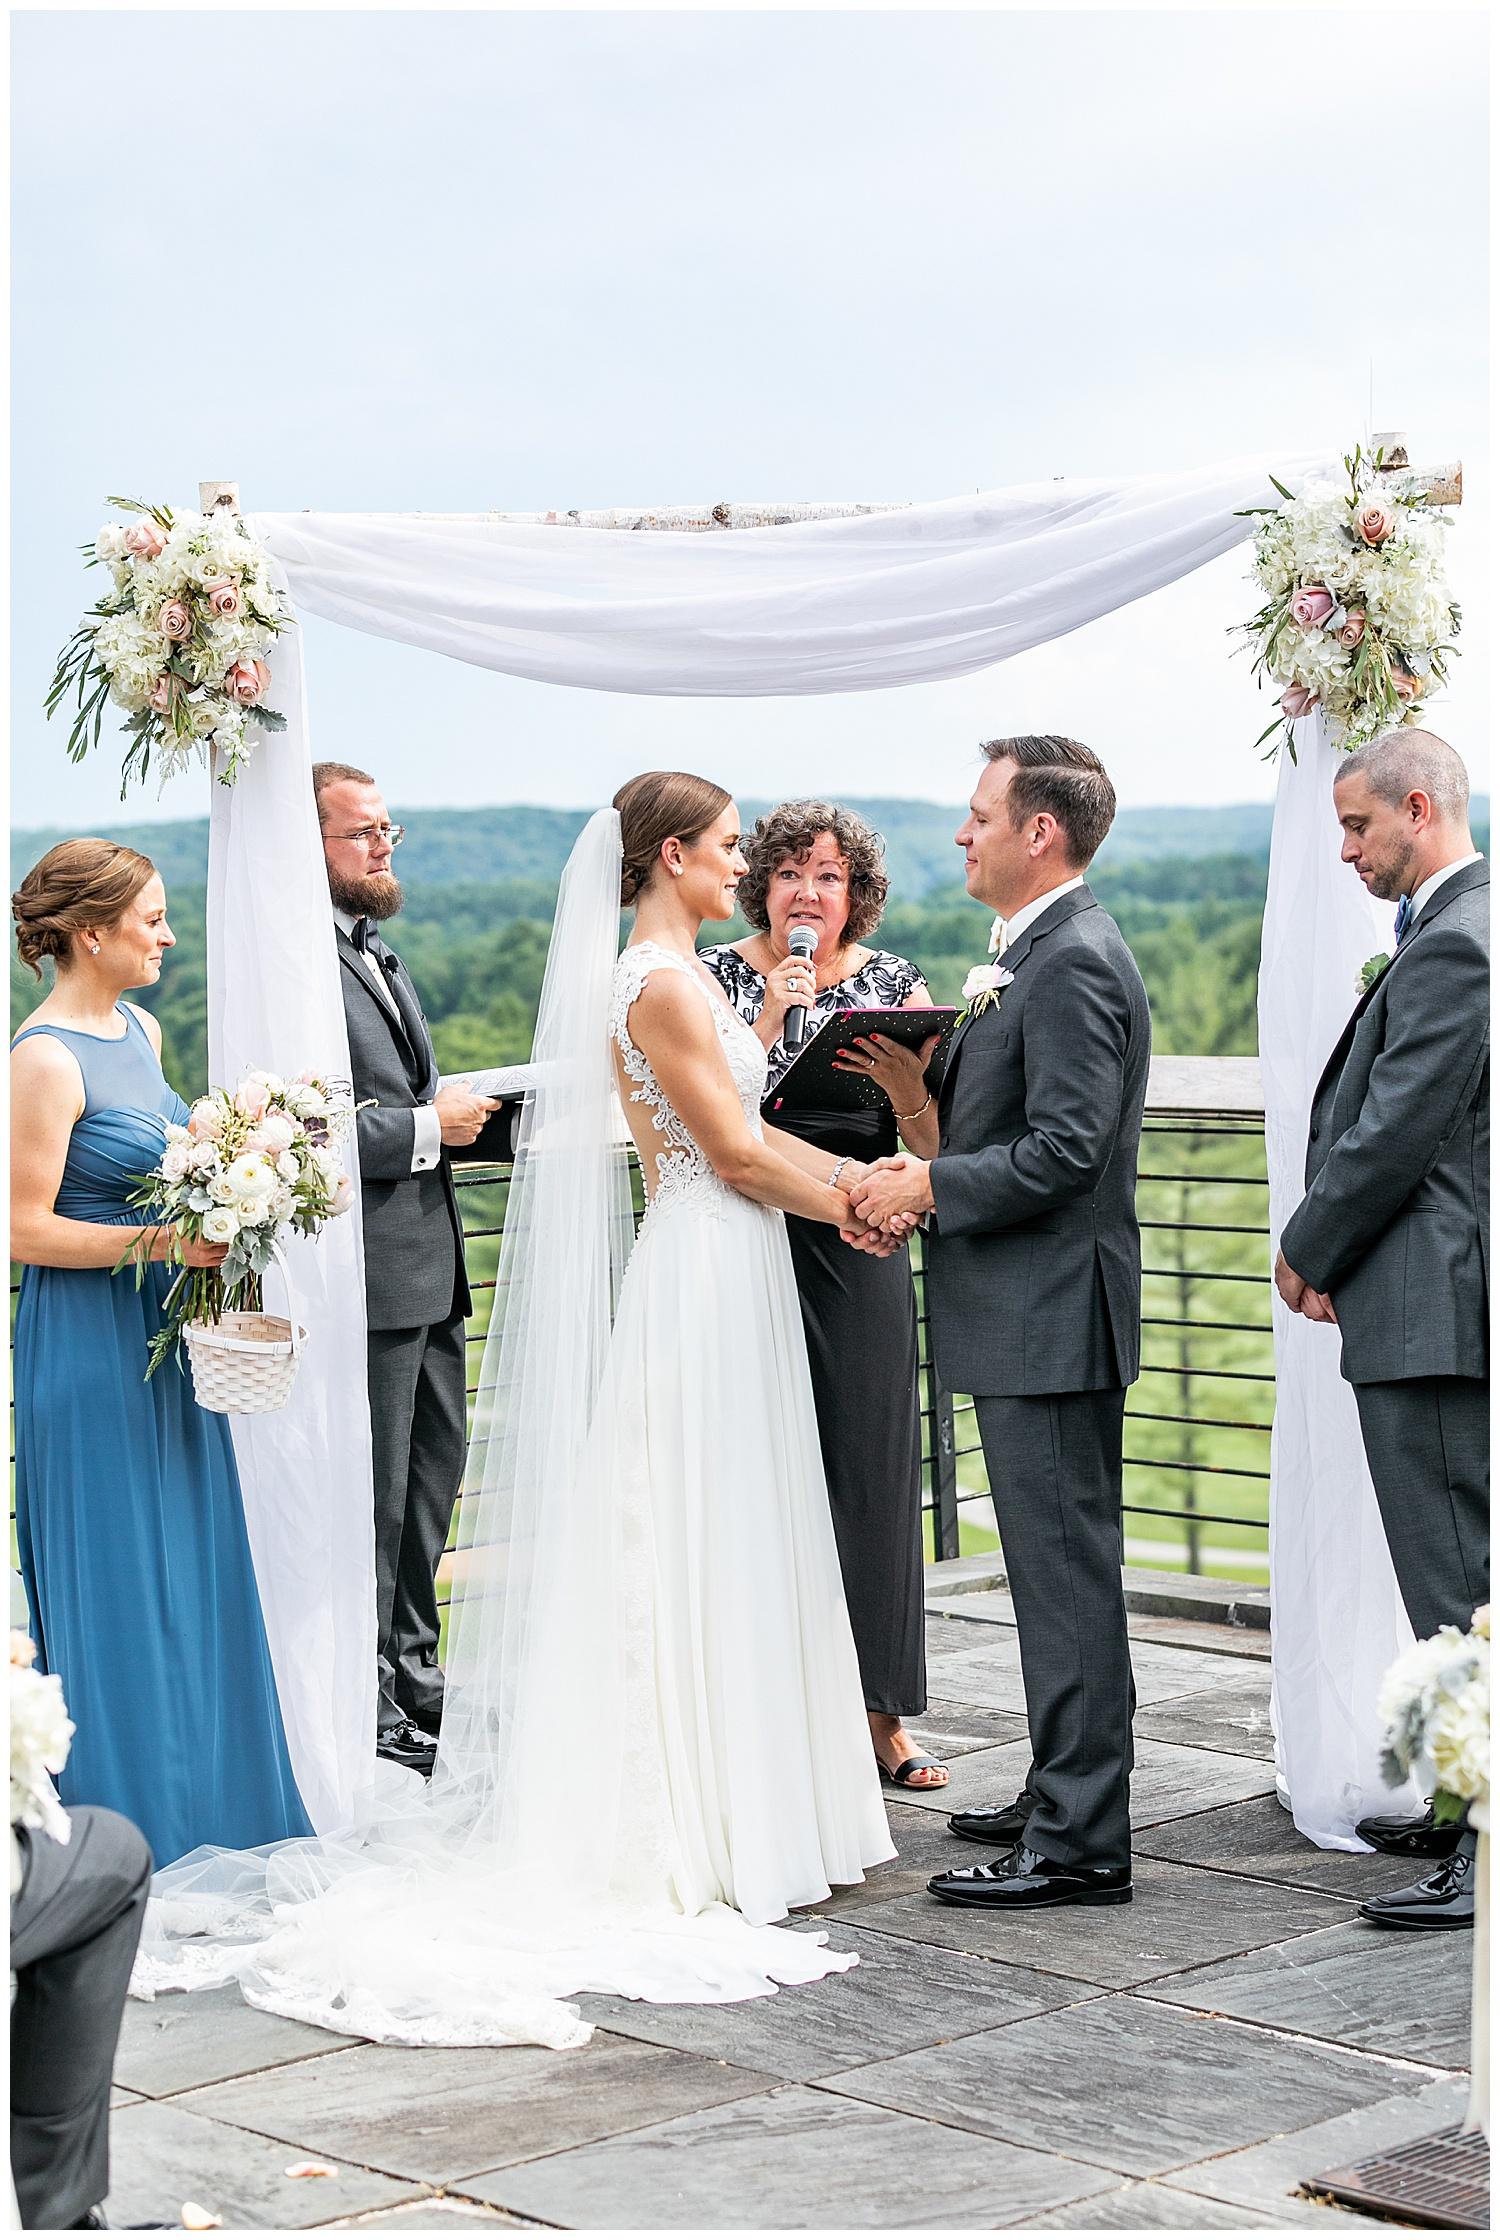 Lindsay Josh Eagles Nest Country Club Wedding Living Radiant Photography photos_0051.jpg